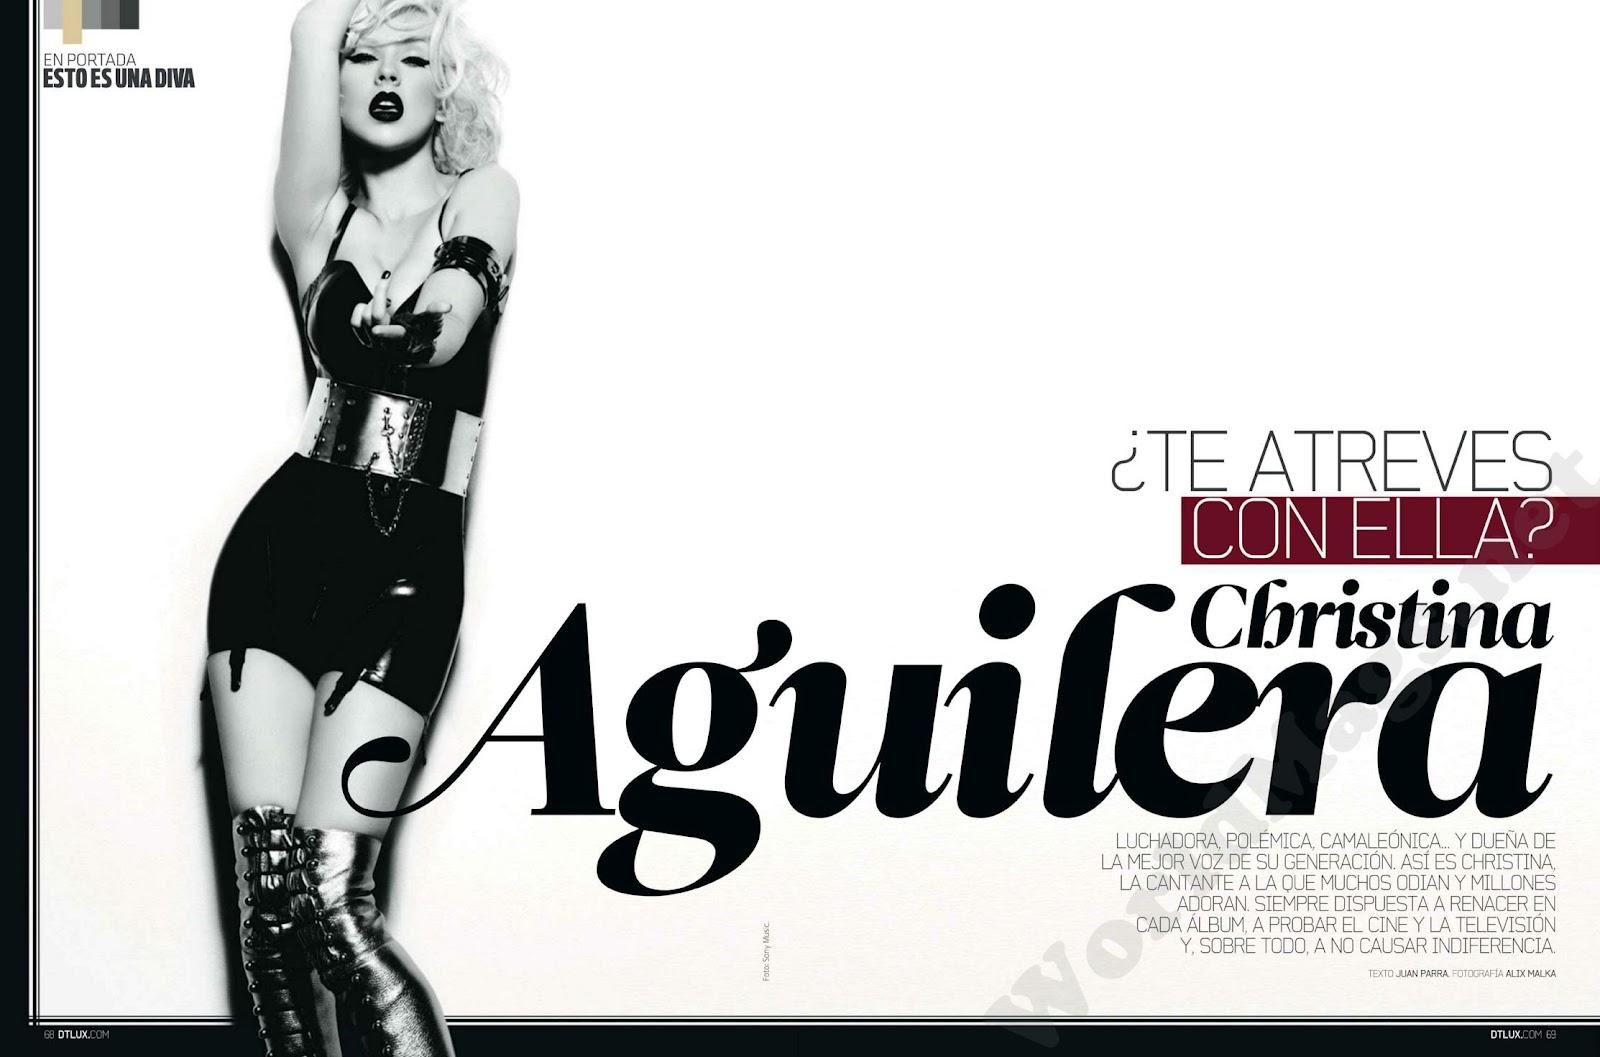 http://3.bp.blogspot.com/-cnSc6fgDf4k/T4_XYuikuVI/AAAAAAAAHxA/YiSEbsOBqnA/s1600/Christina-Aguilera-DT-Magazine-April-2012-2.jpg